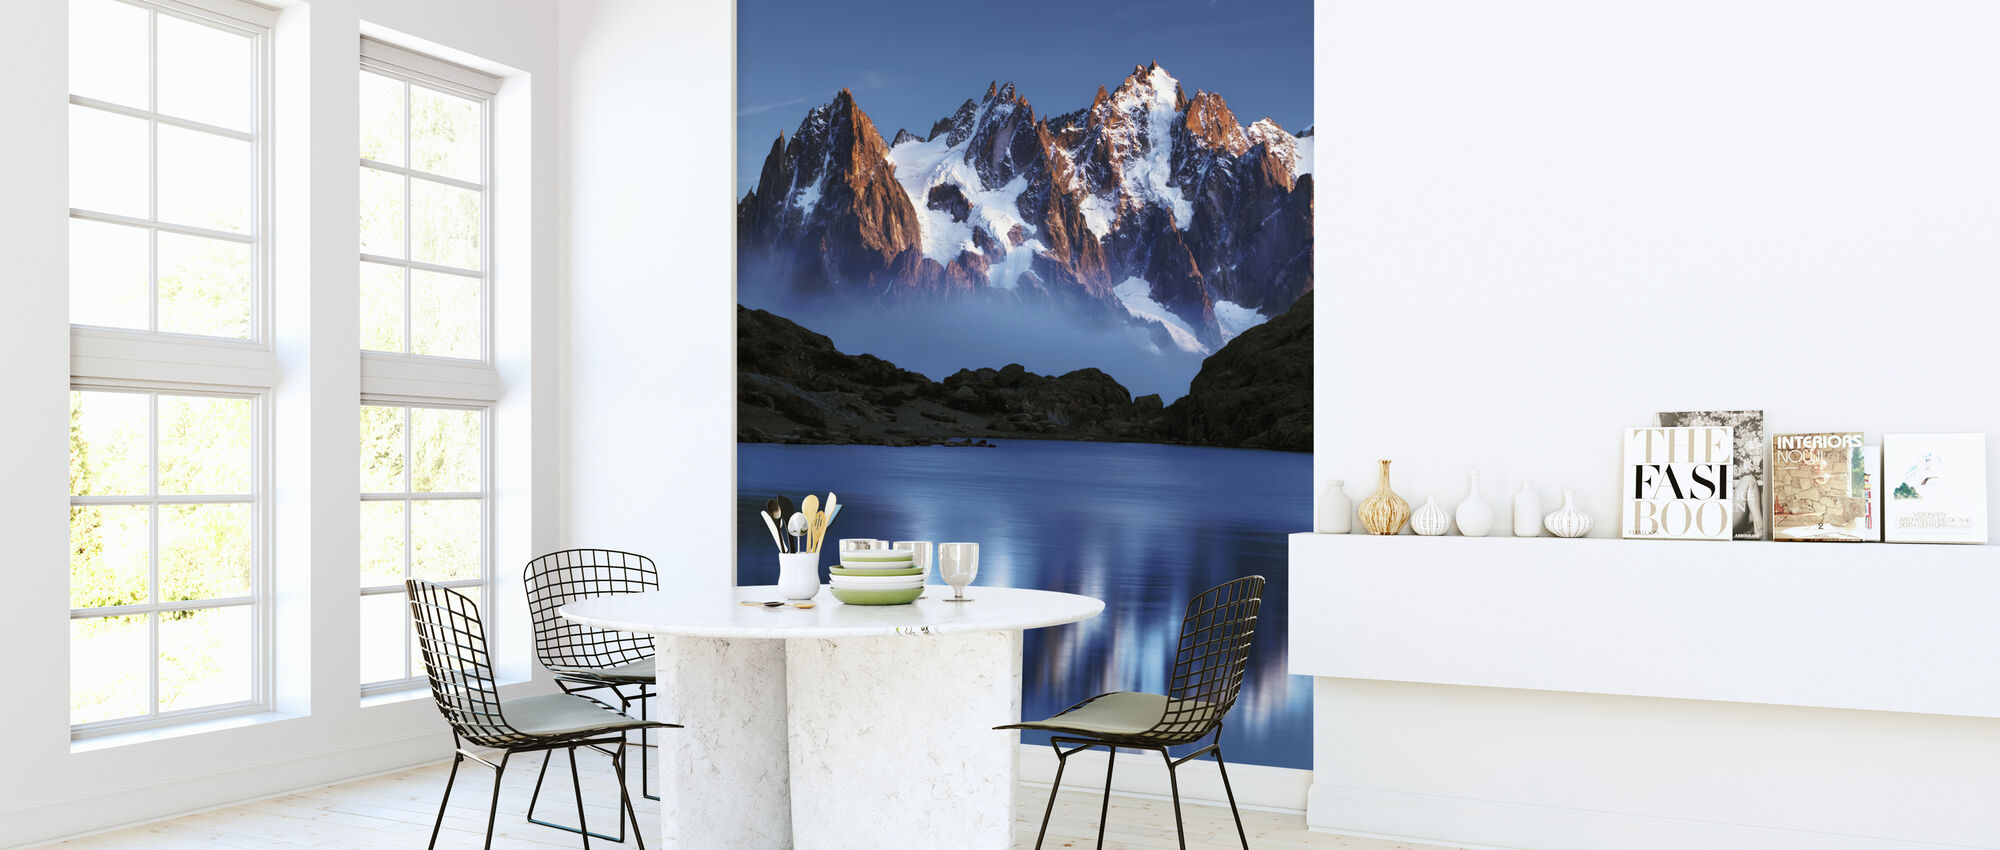 Blue Mountain Mirror - Wallpaper - Kitchen